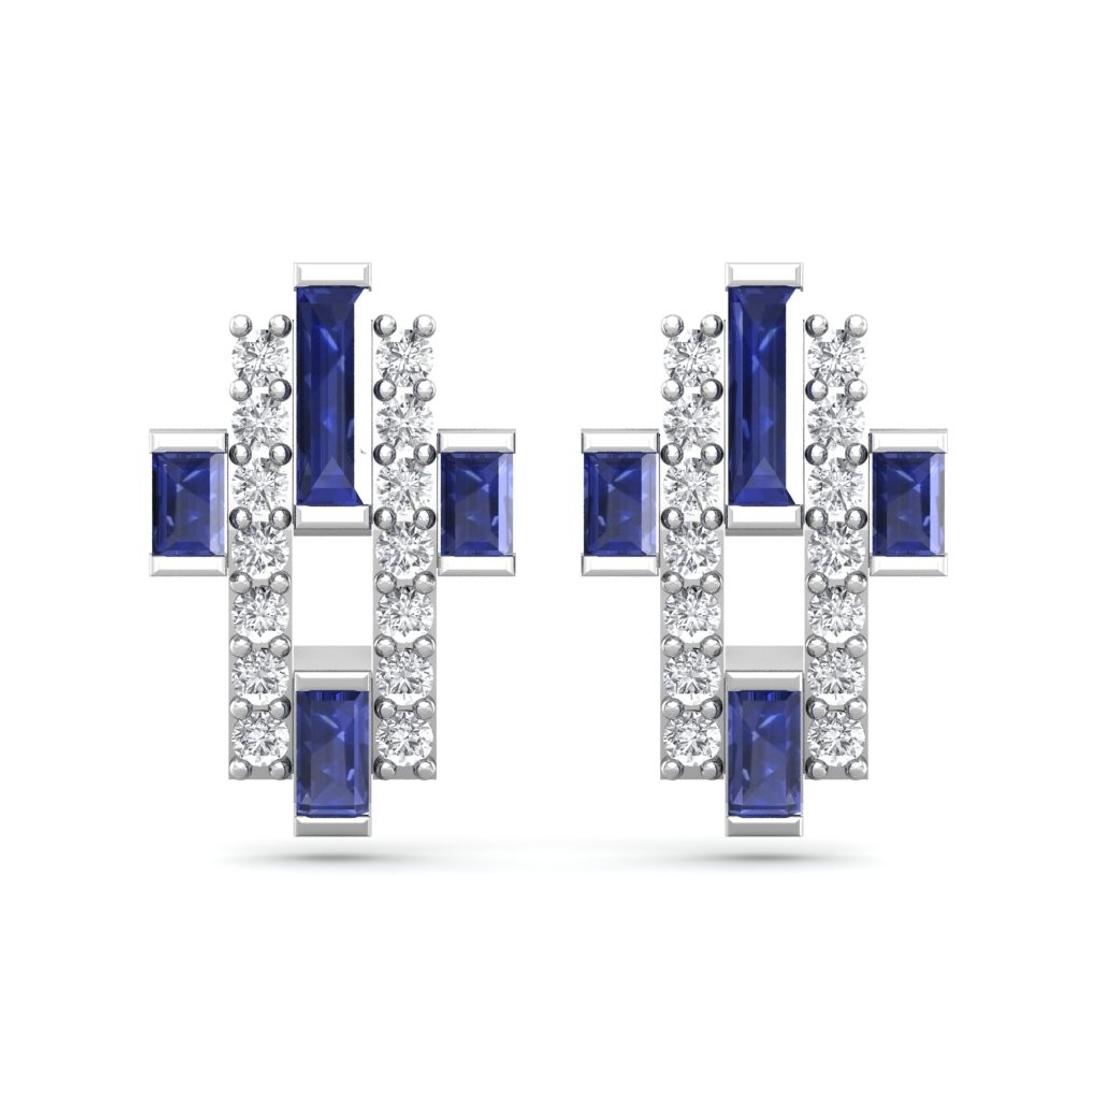 Sarvada Jewels' The Joy Earrings